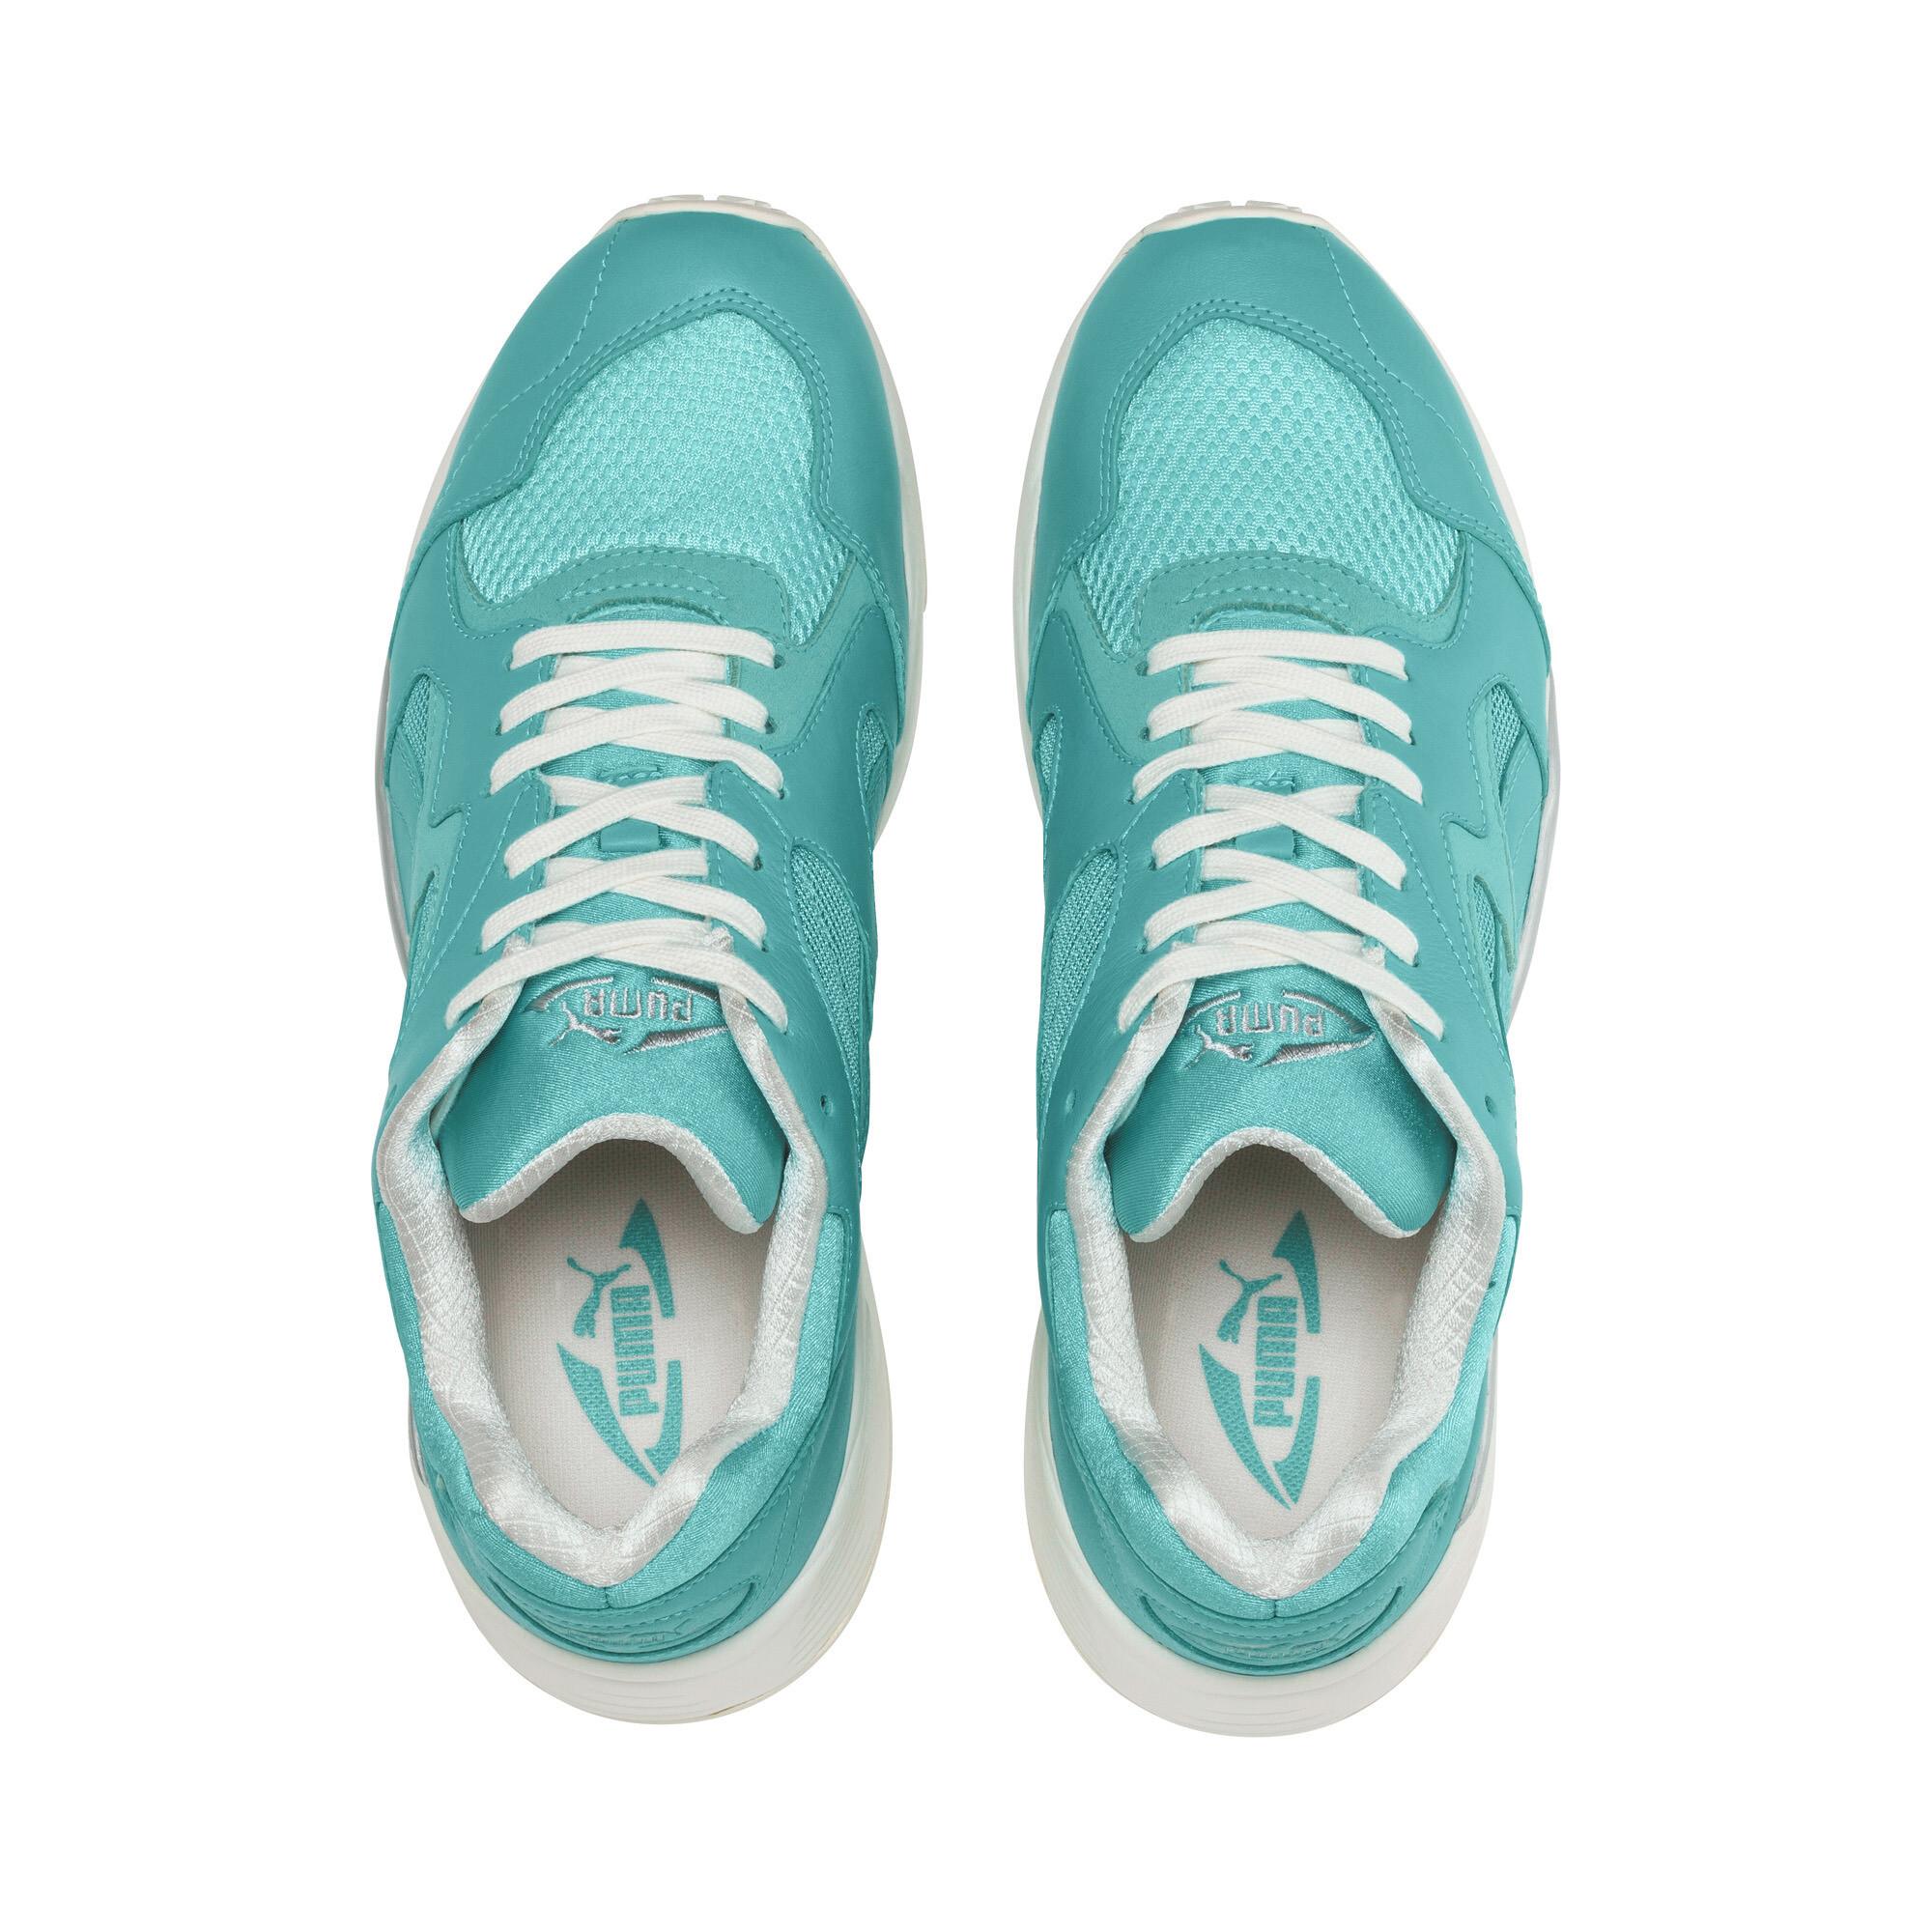 PUMA-Prevail-IR-Reality-Sneakers-Unisex-Shoe thumbnail 7